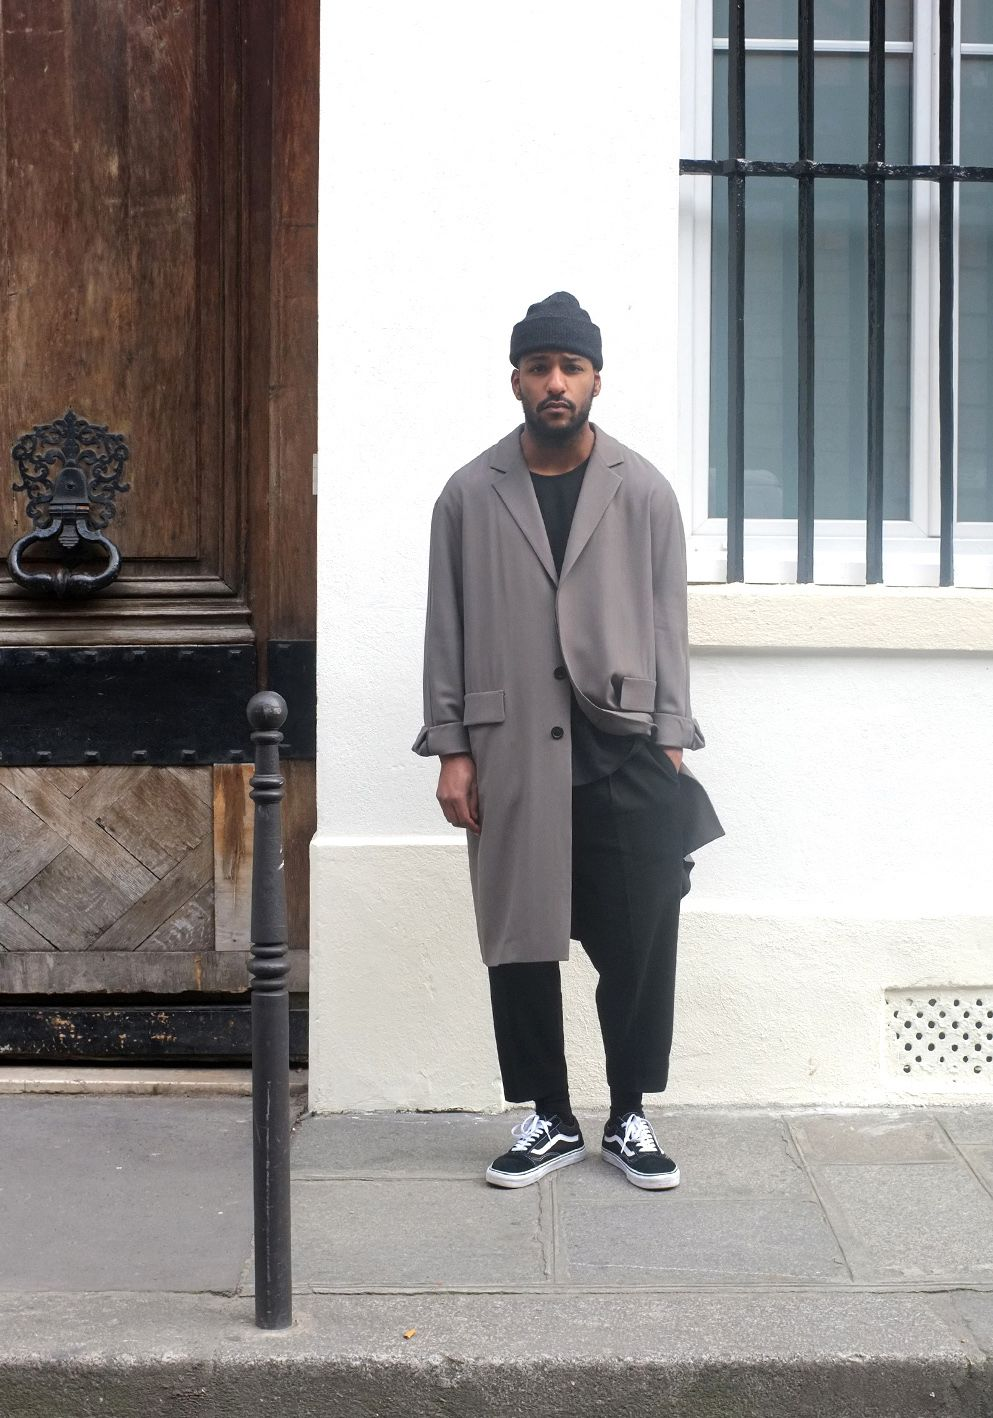 Winter style  men s wear  men s fashion  long coat  oversized overcoat   beanie  pleated pant  casual Friday  street style   men in style b7c784e3eb